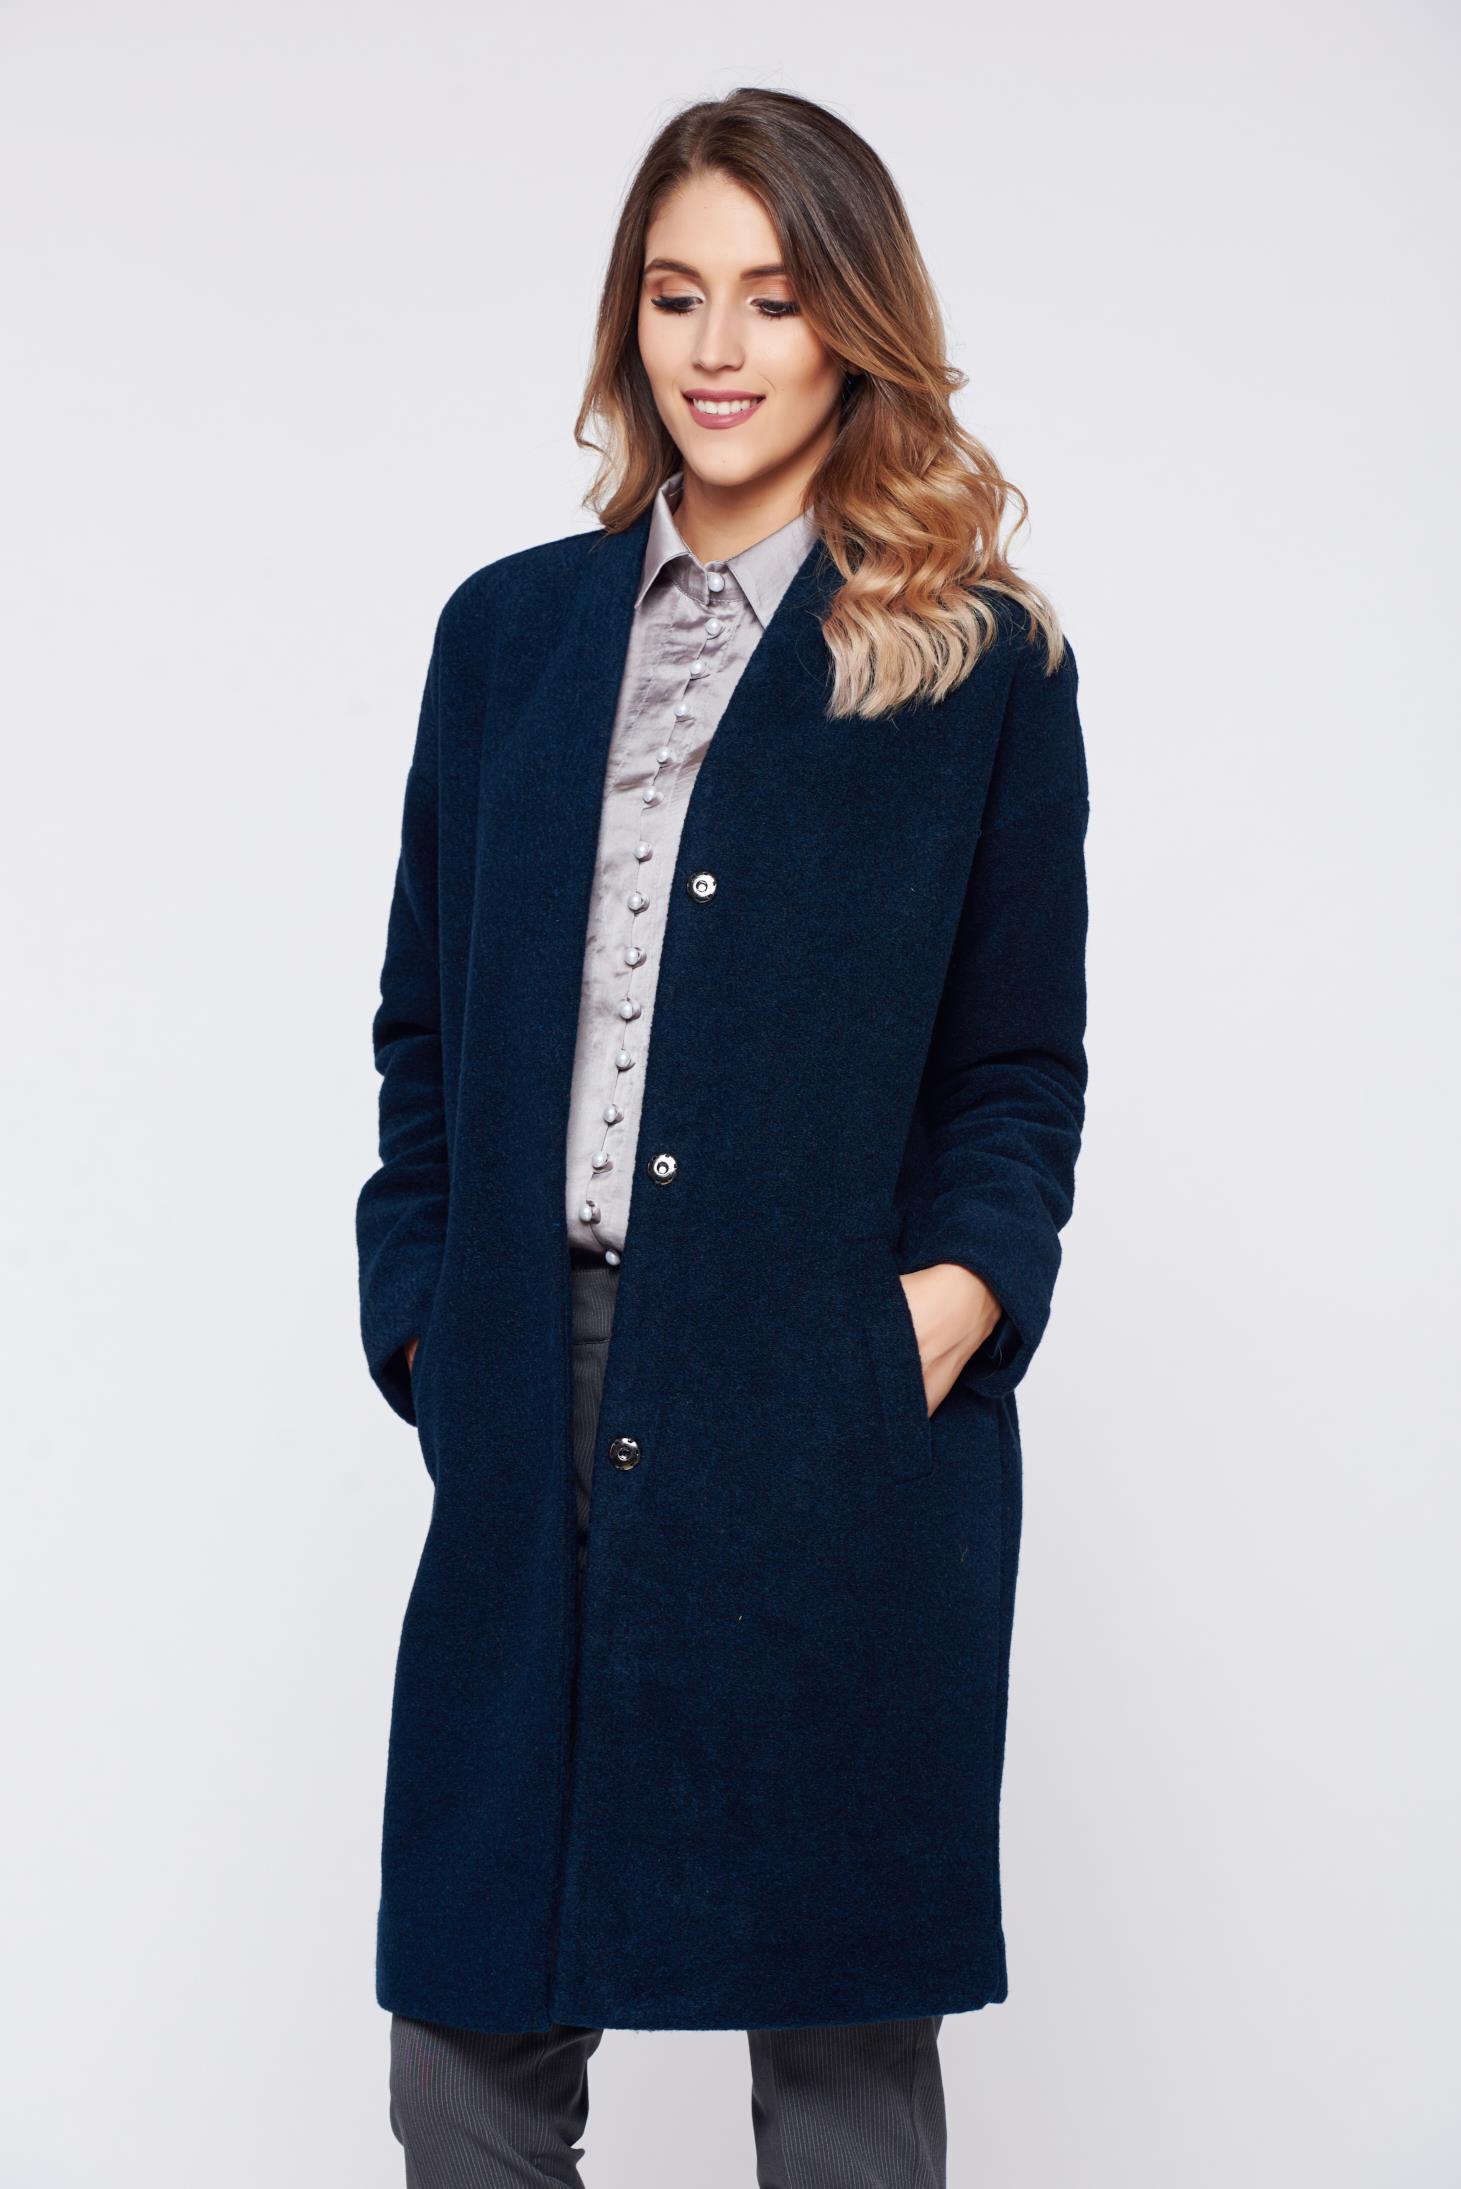 Palton Top Secret albastru-inchis casual cu maneca lunga si croi larg